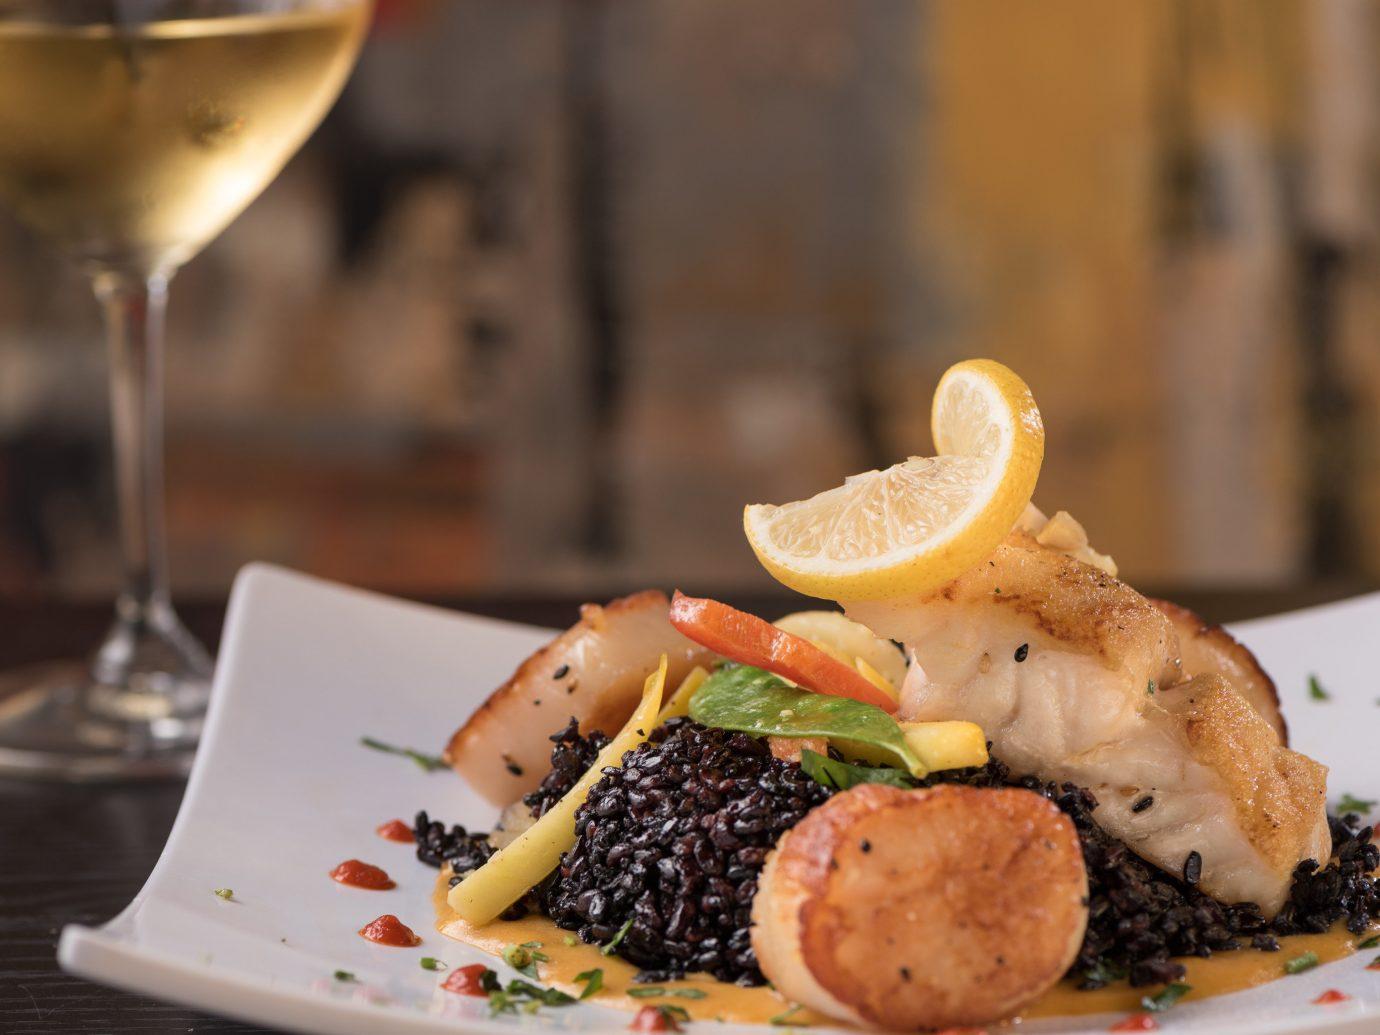 table food indoor plate dish restaurant meal fish cuisine dinner brunch produce sense piece de resistance